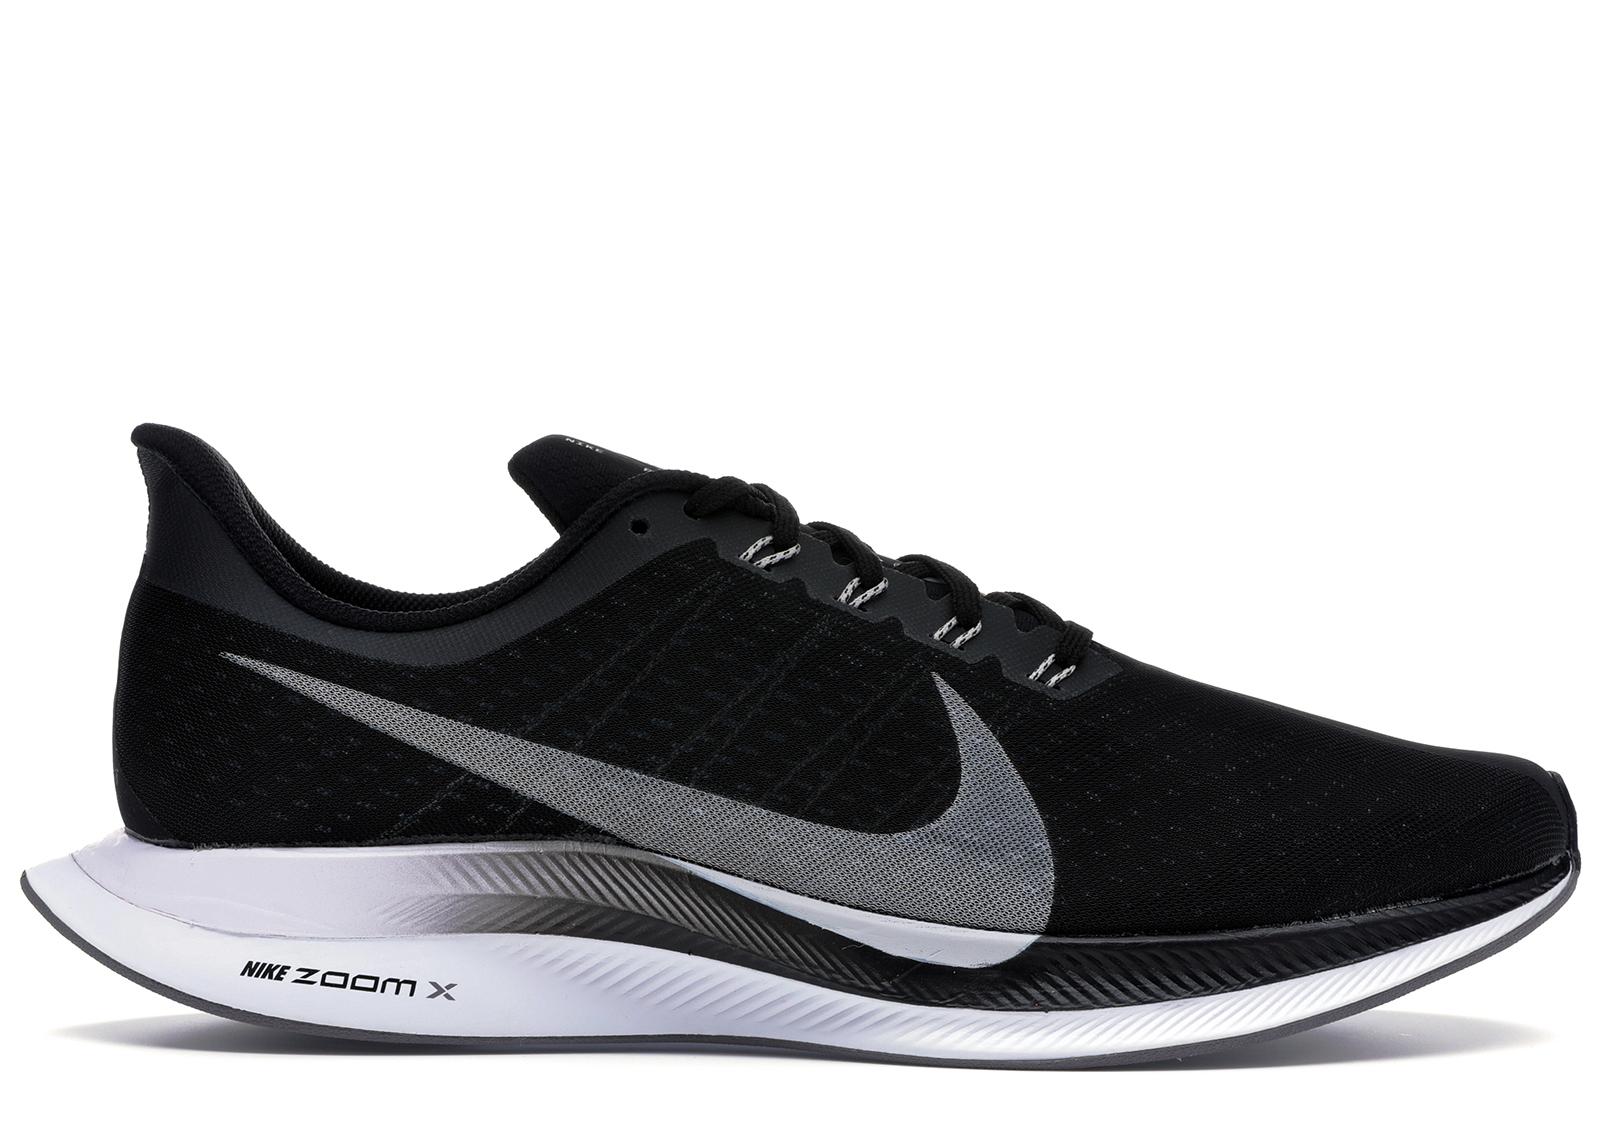 Nike Zoom Pegasus 35 Turbo Black Vast Grey - AJ4114-001